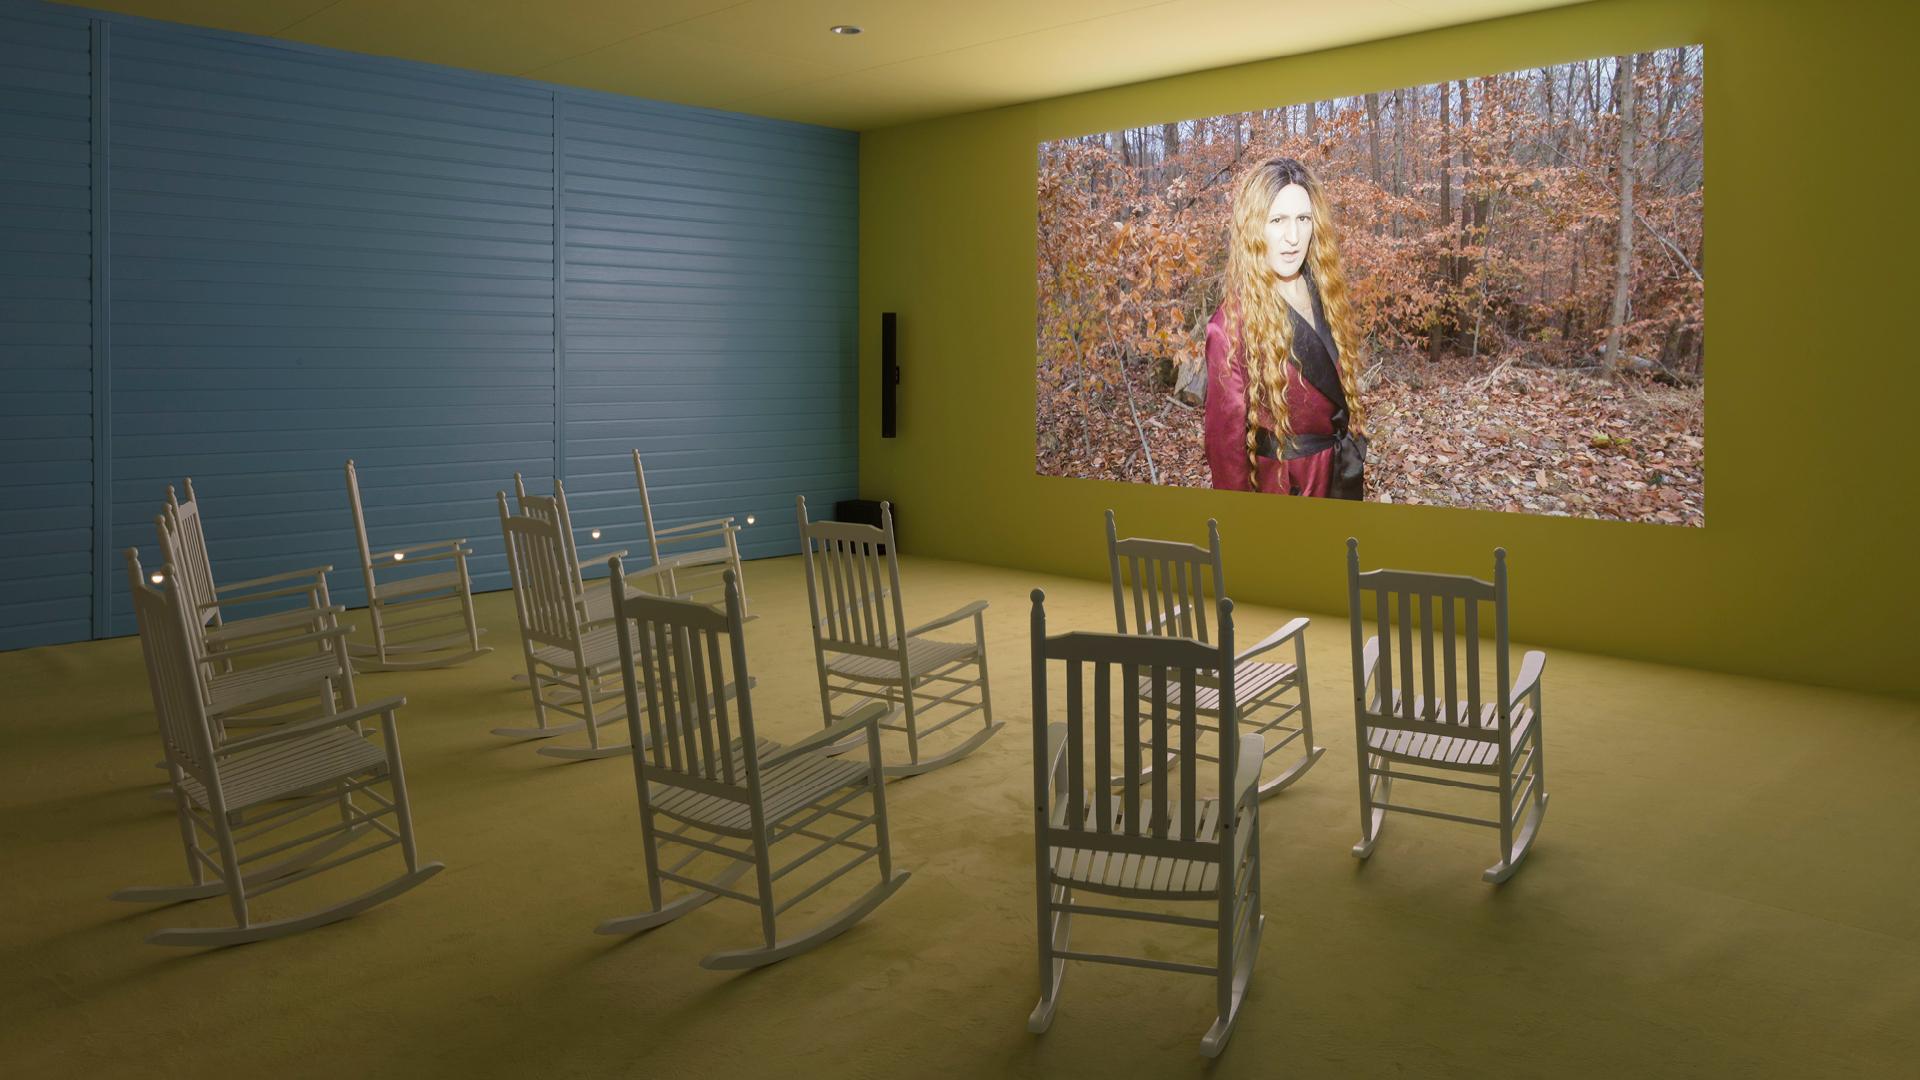 The Movies, 2019, Lizzie Fitch, Installation shot 1 | Ryan Trecartin Fondazione Prada, 2019 | Whether Line| Lizzie Fitch | Ryan Trecartin | Fondazione Prada|STIR